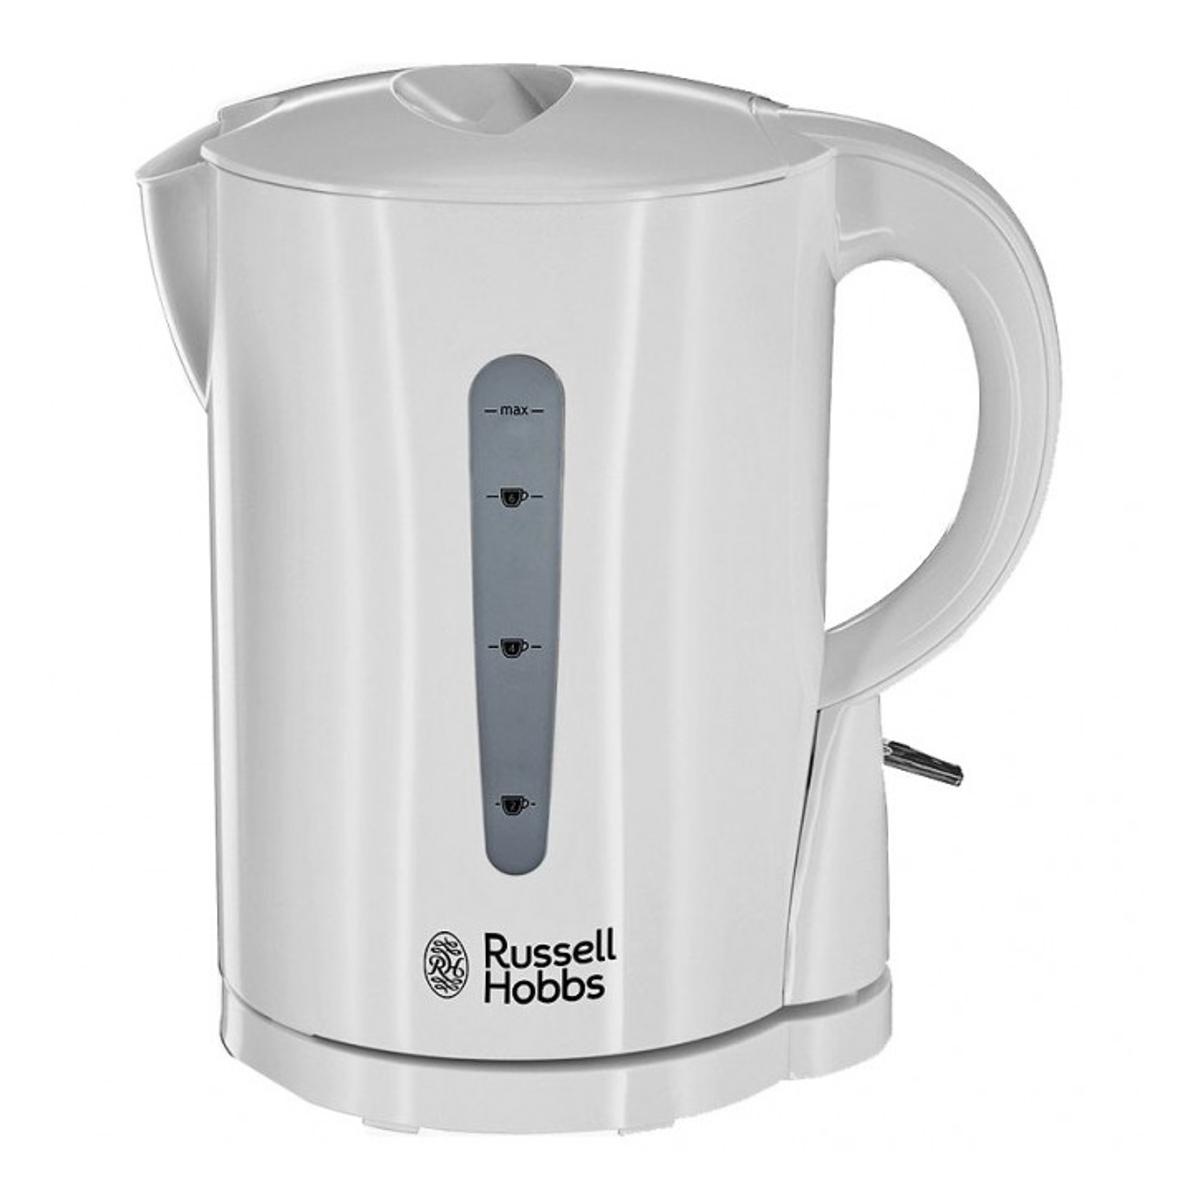 Russell Hobbs 21441 Essentials 2200w 1 7l Kettle Hughes